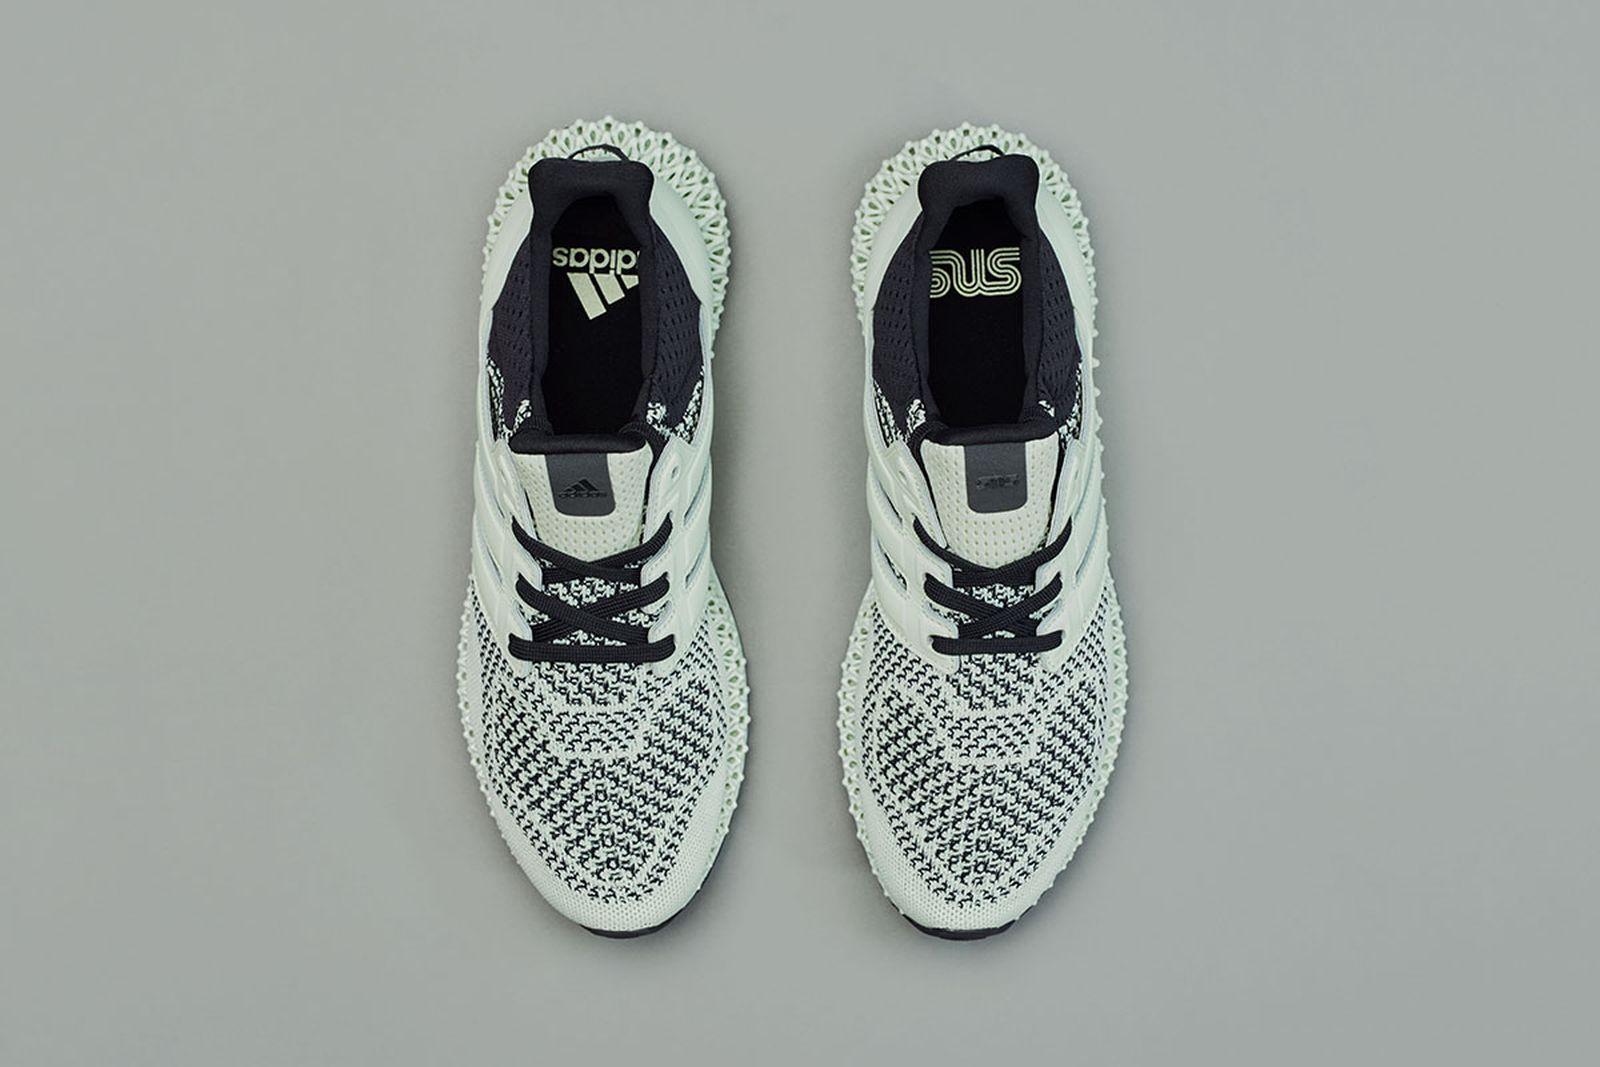 sneakersnstuff-adidas-ultra4d-green-teatime-release-date-price-1-01